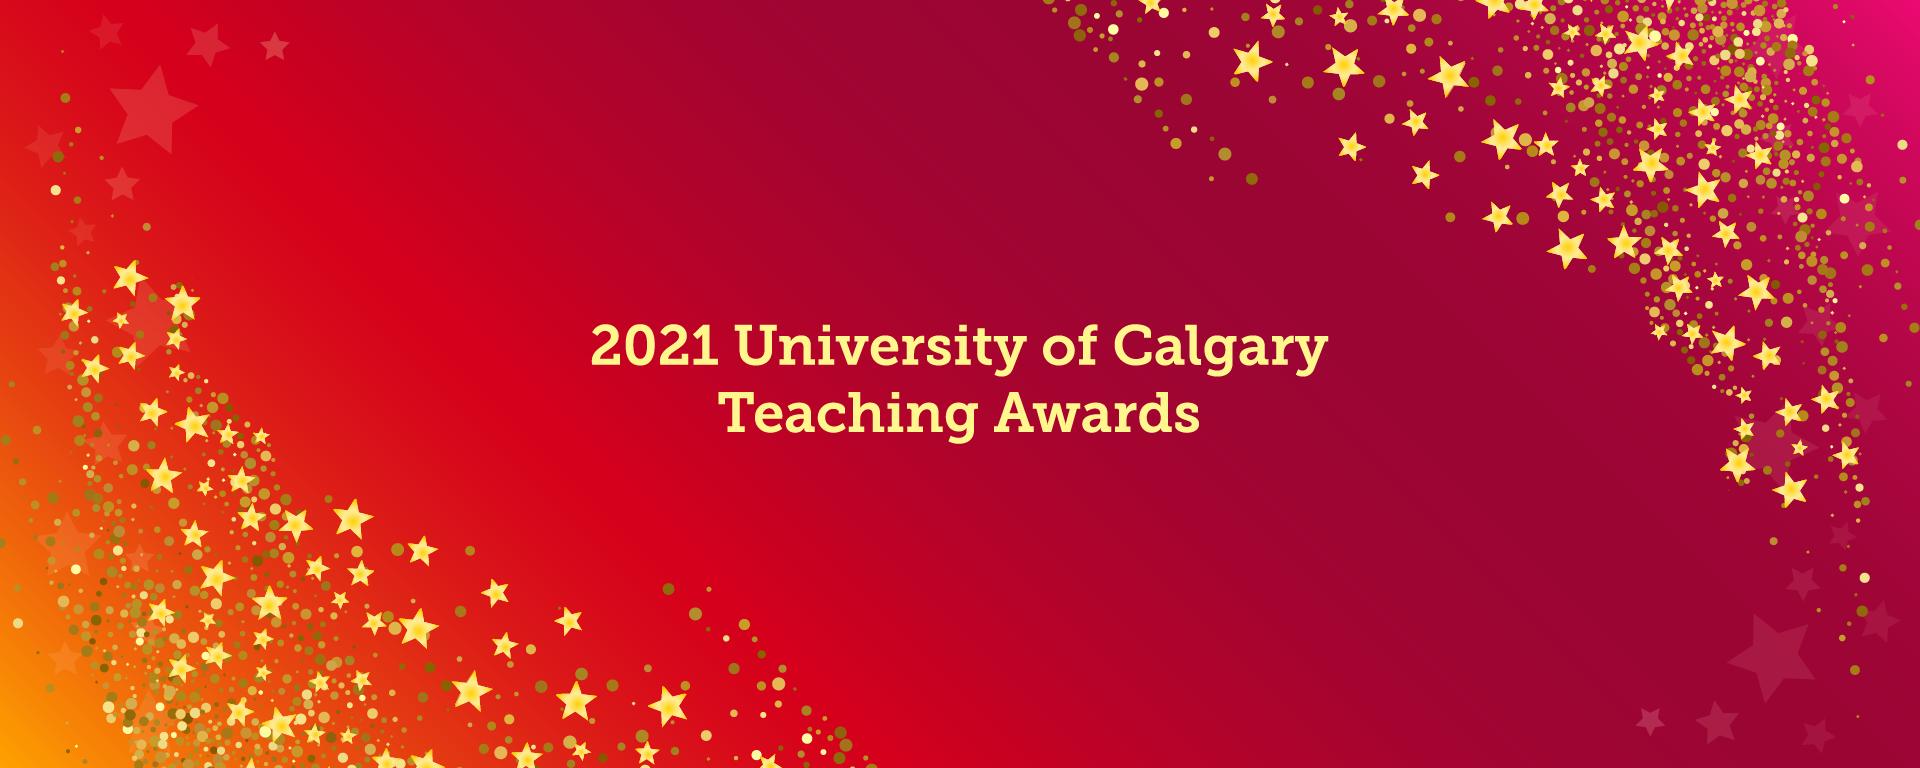 2021 University of Calgary Celebration of Teaching